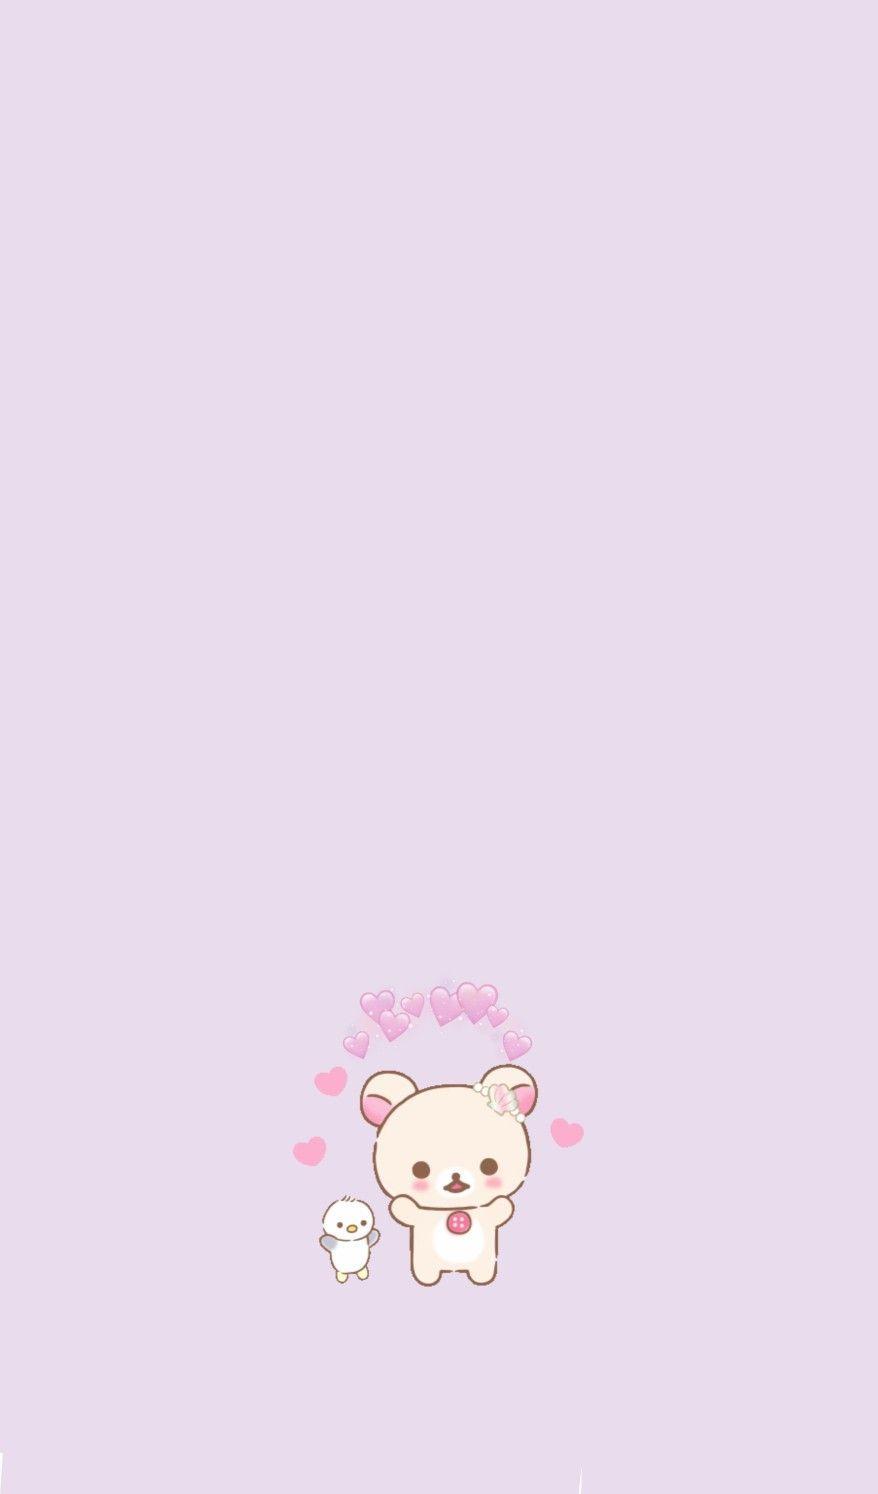 Cute Iphone Aesthetic Pastel Wallpaper In 2020 Cute Pastel Wallpaper Soft Wallpaper Pink Wallpaper Anime